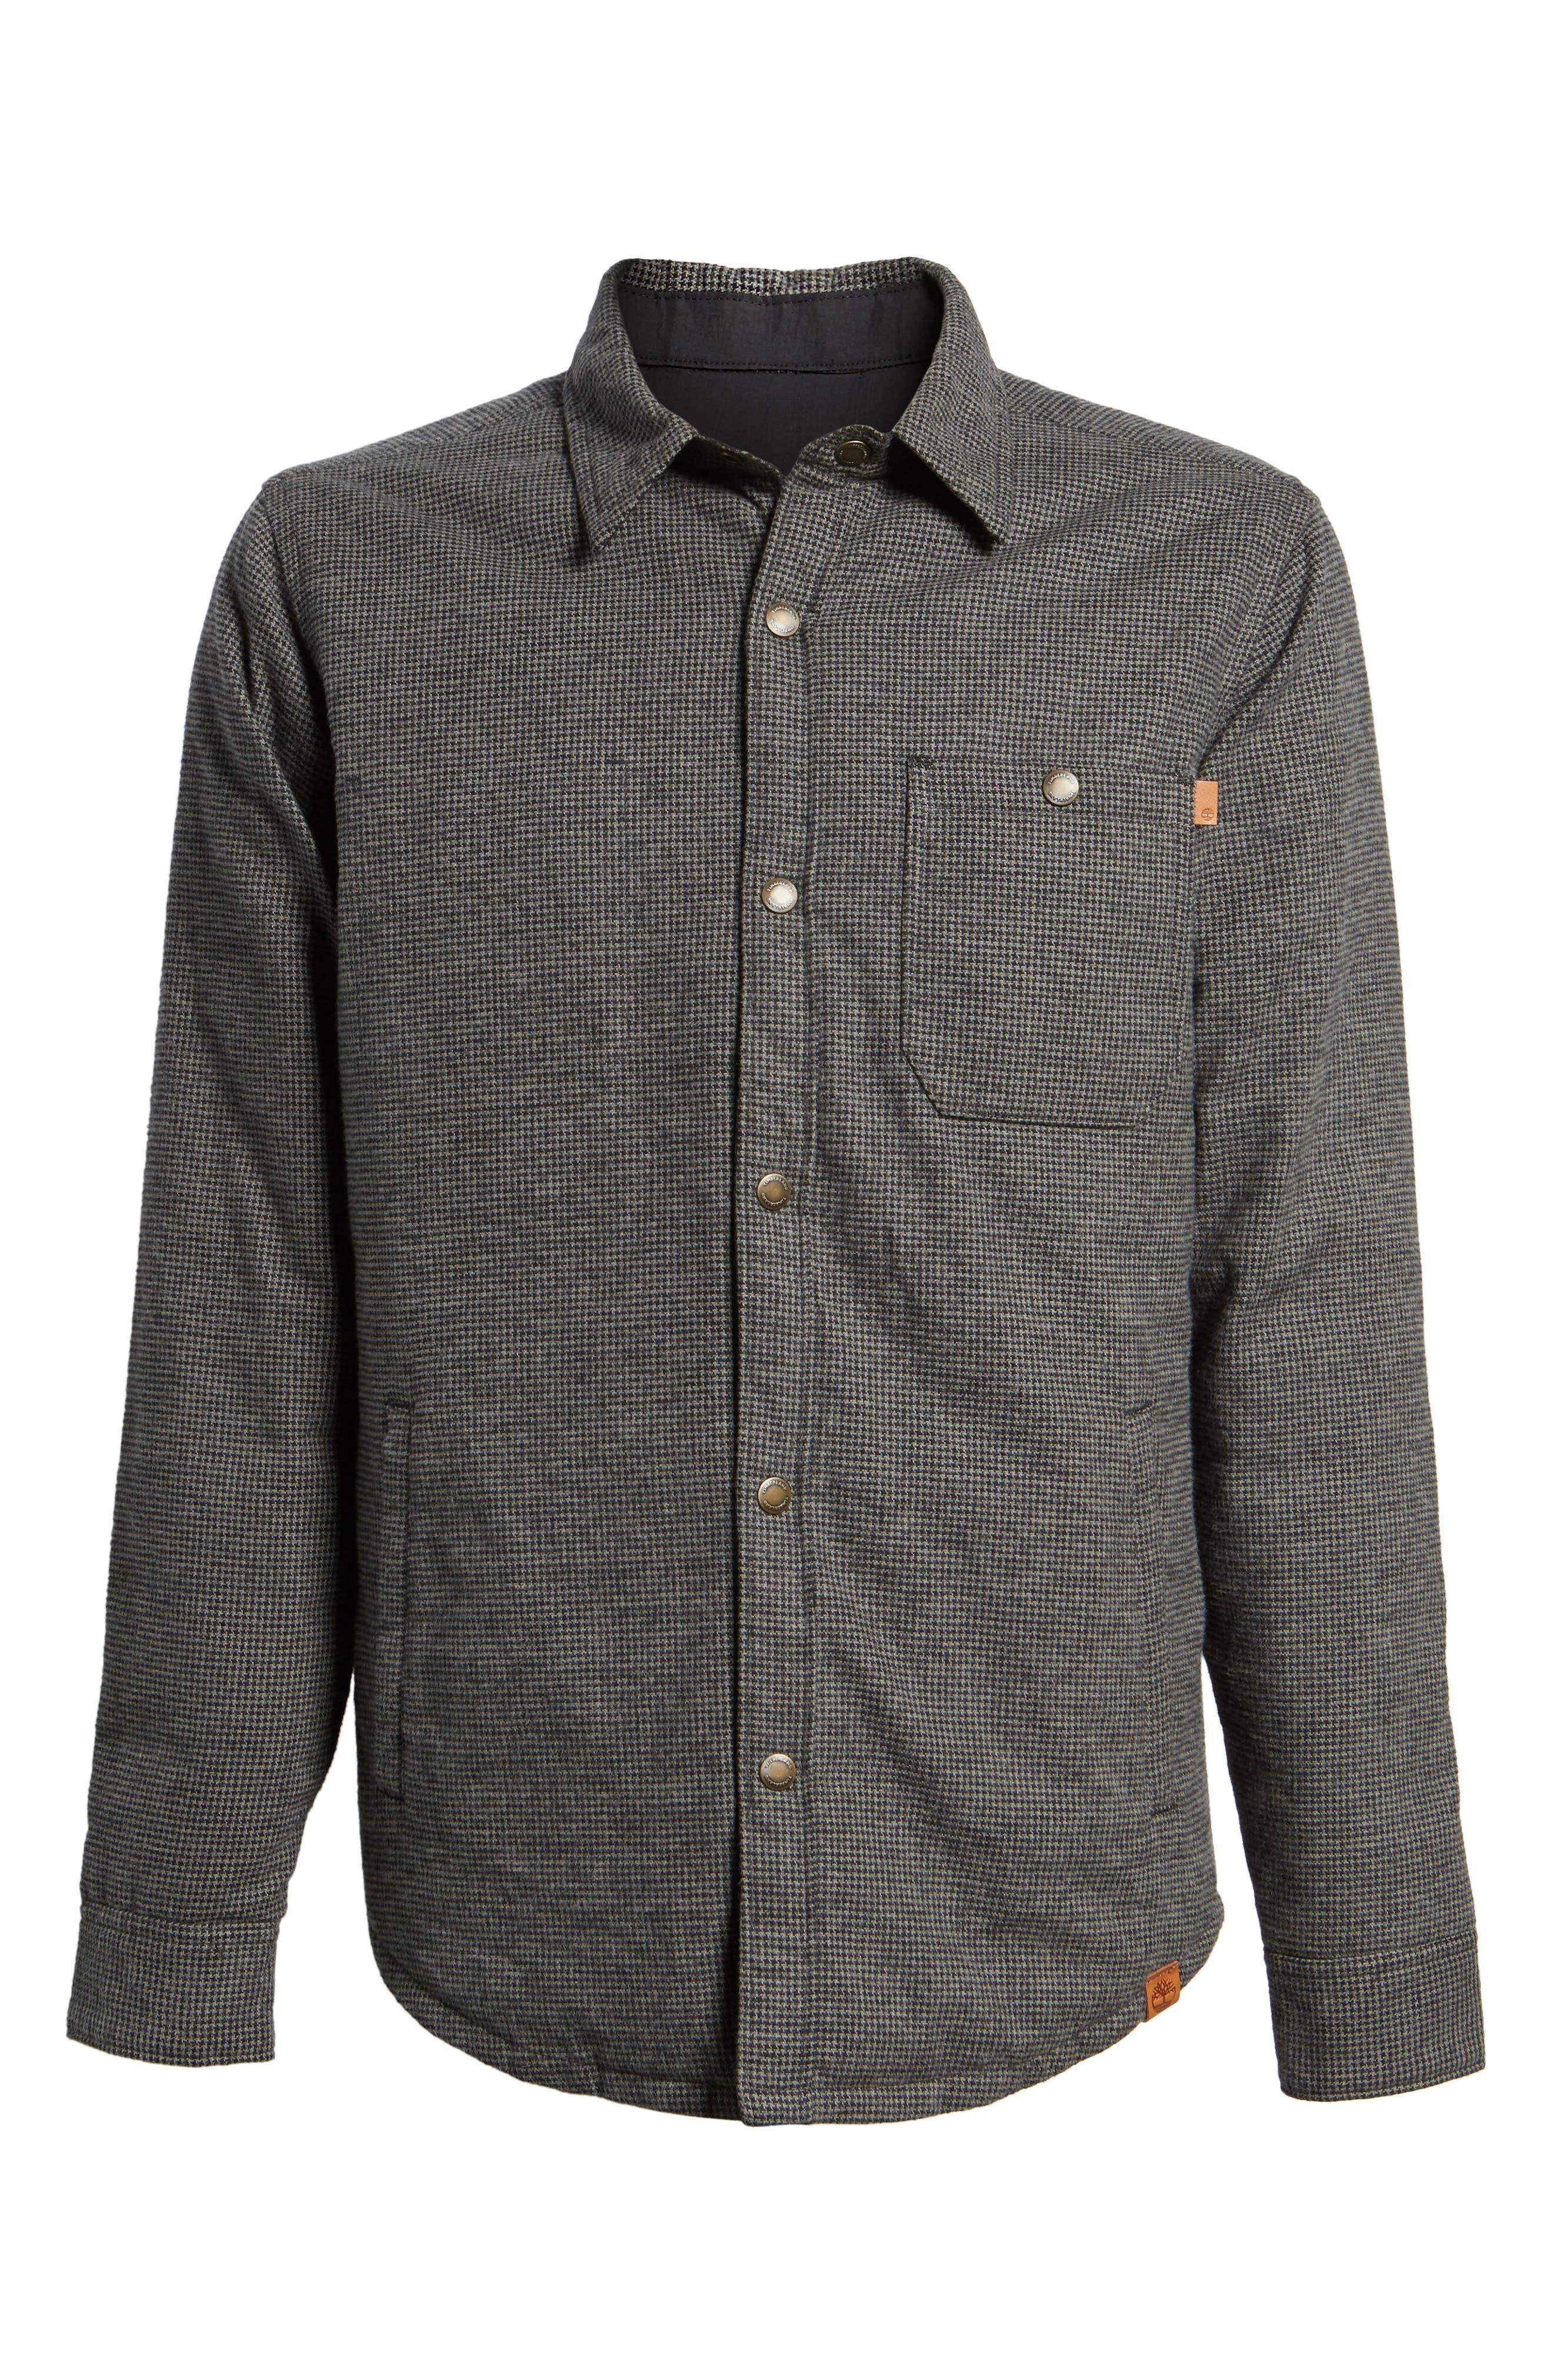 Gunstock River Reversible Down Shirt Jacket,                             Alternate thumbnail 5, color,                             001